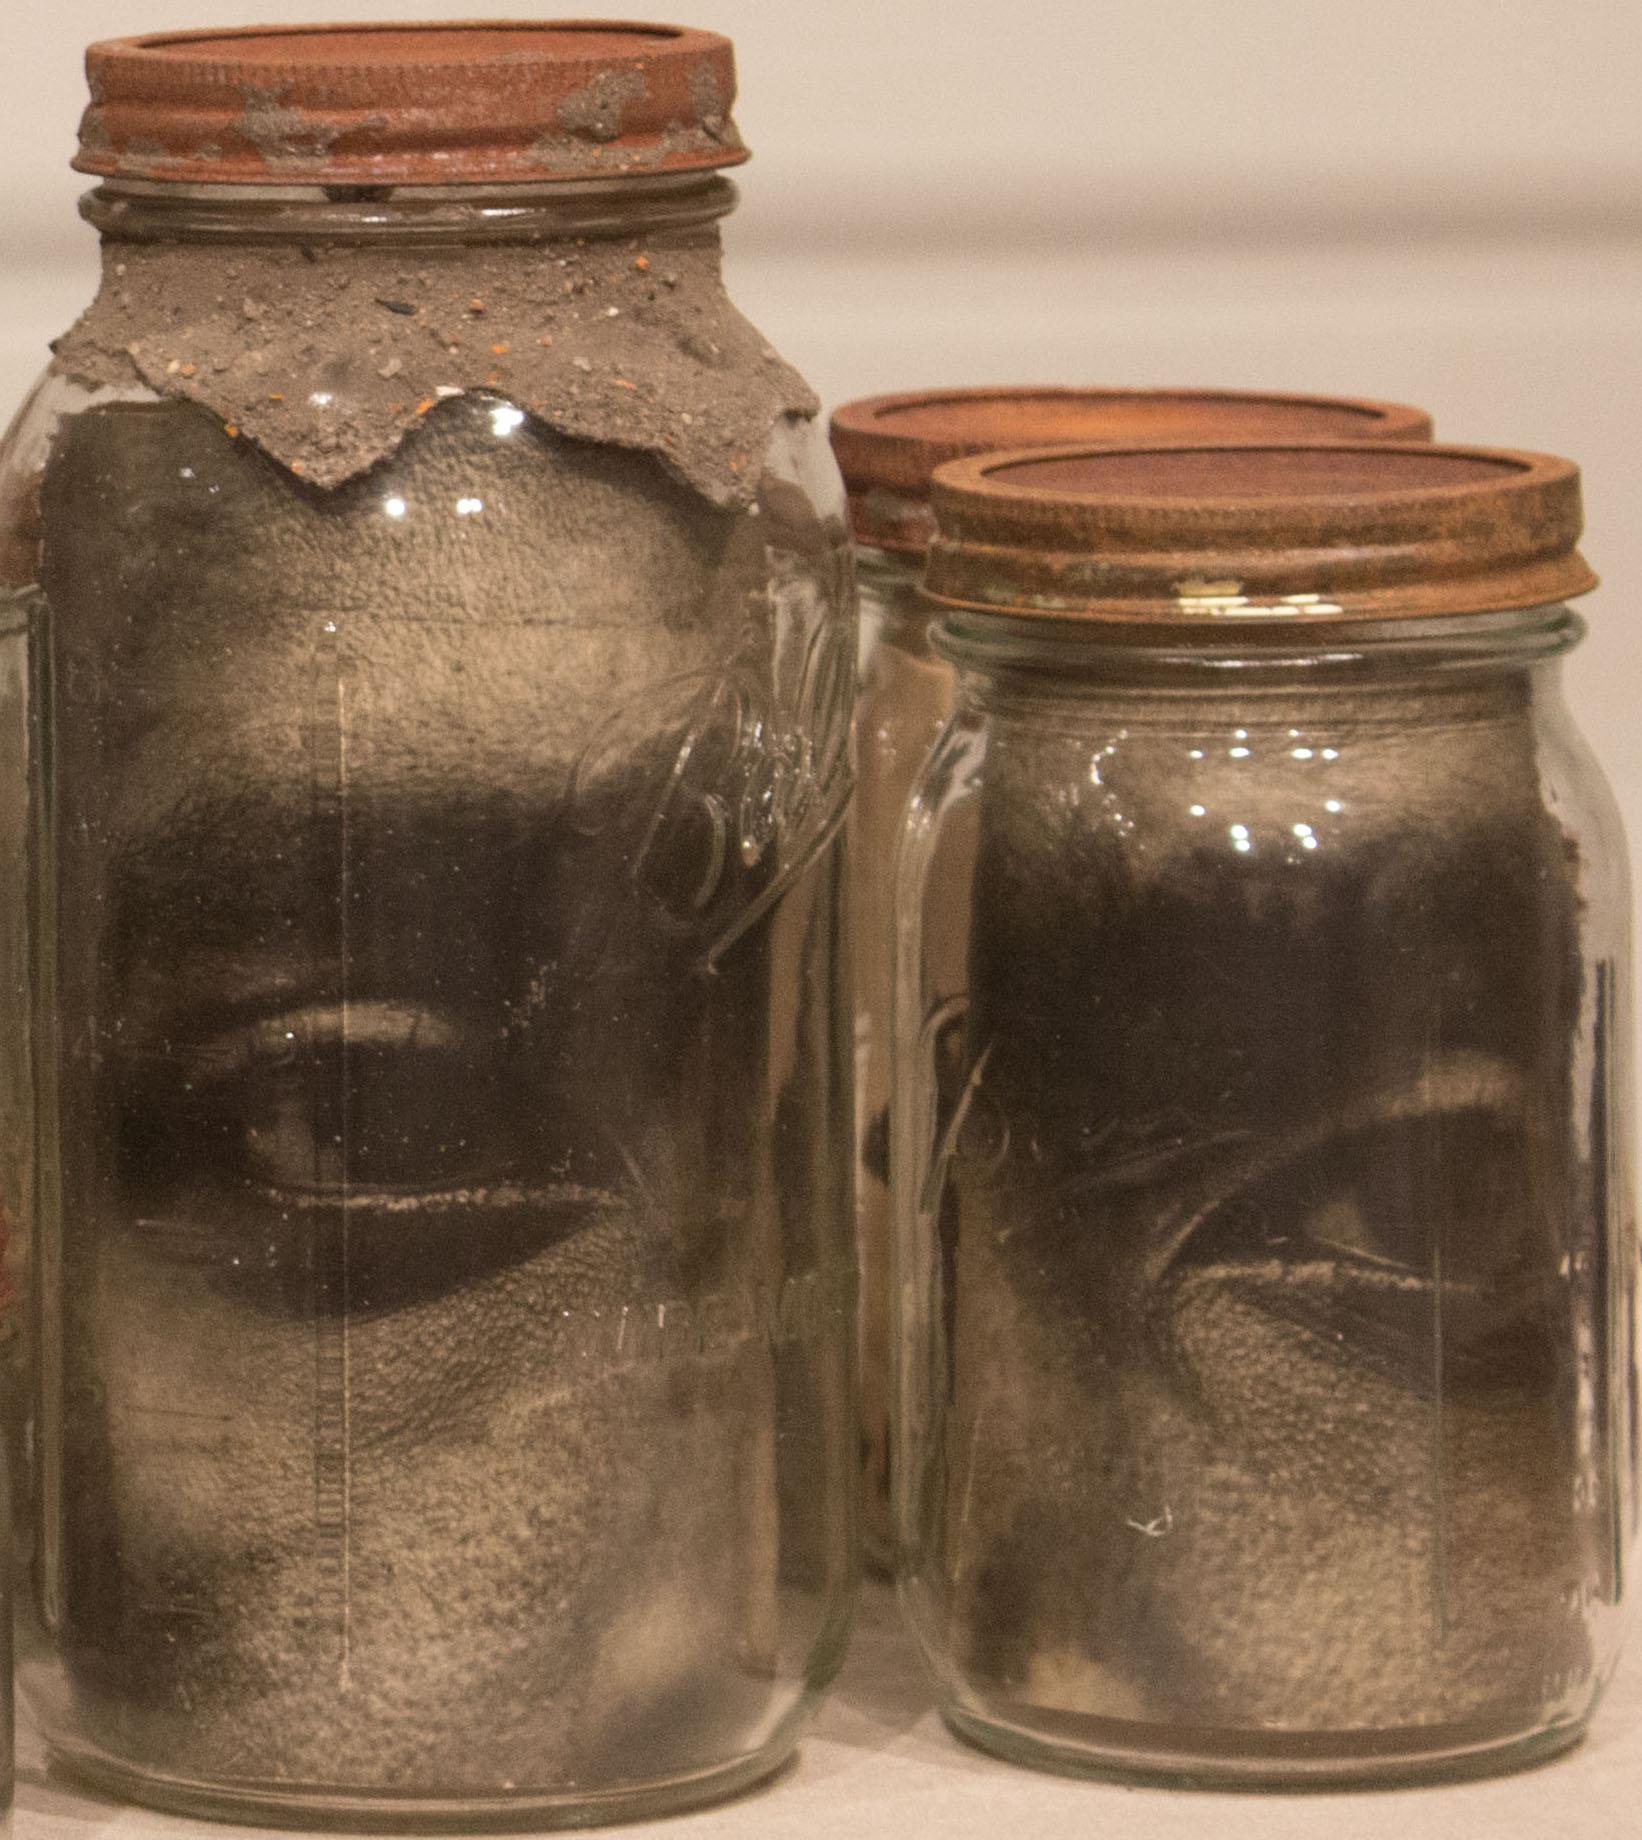 Souvenir Jars © Renee Billingslea, used with permission of the artist.